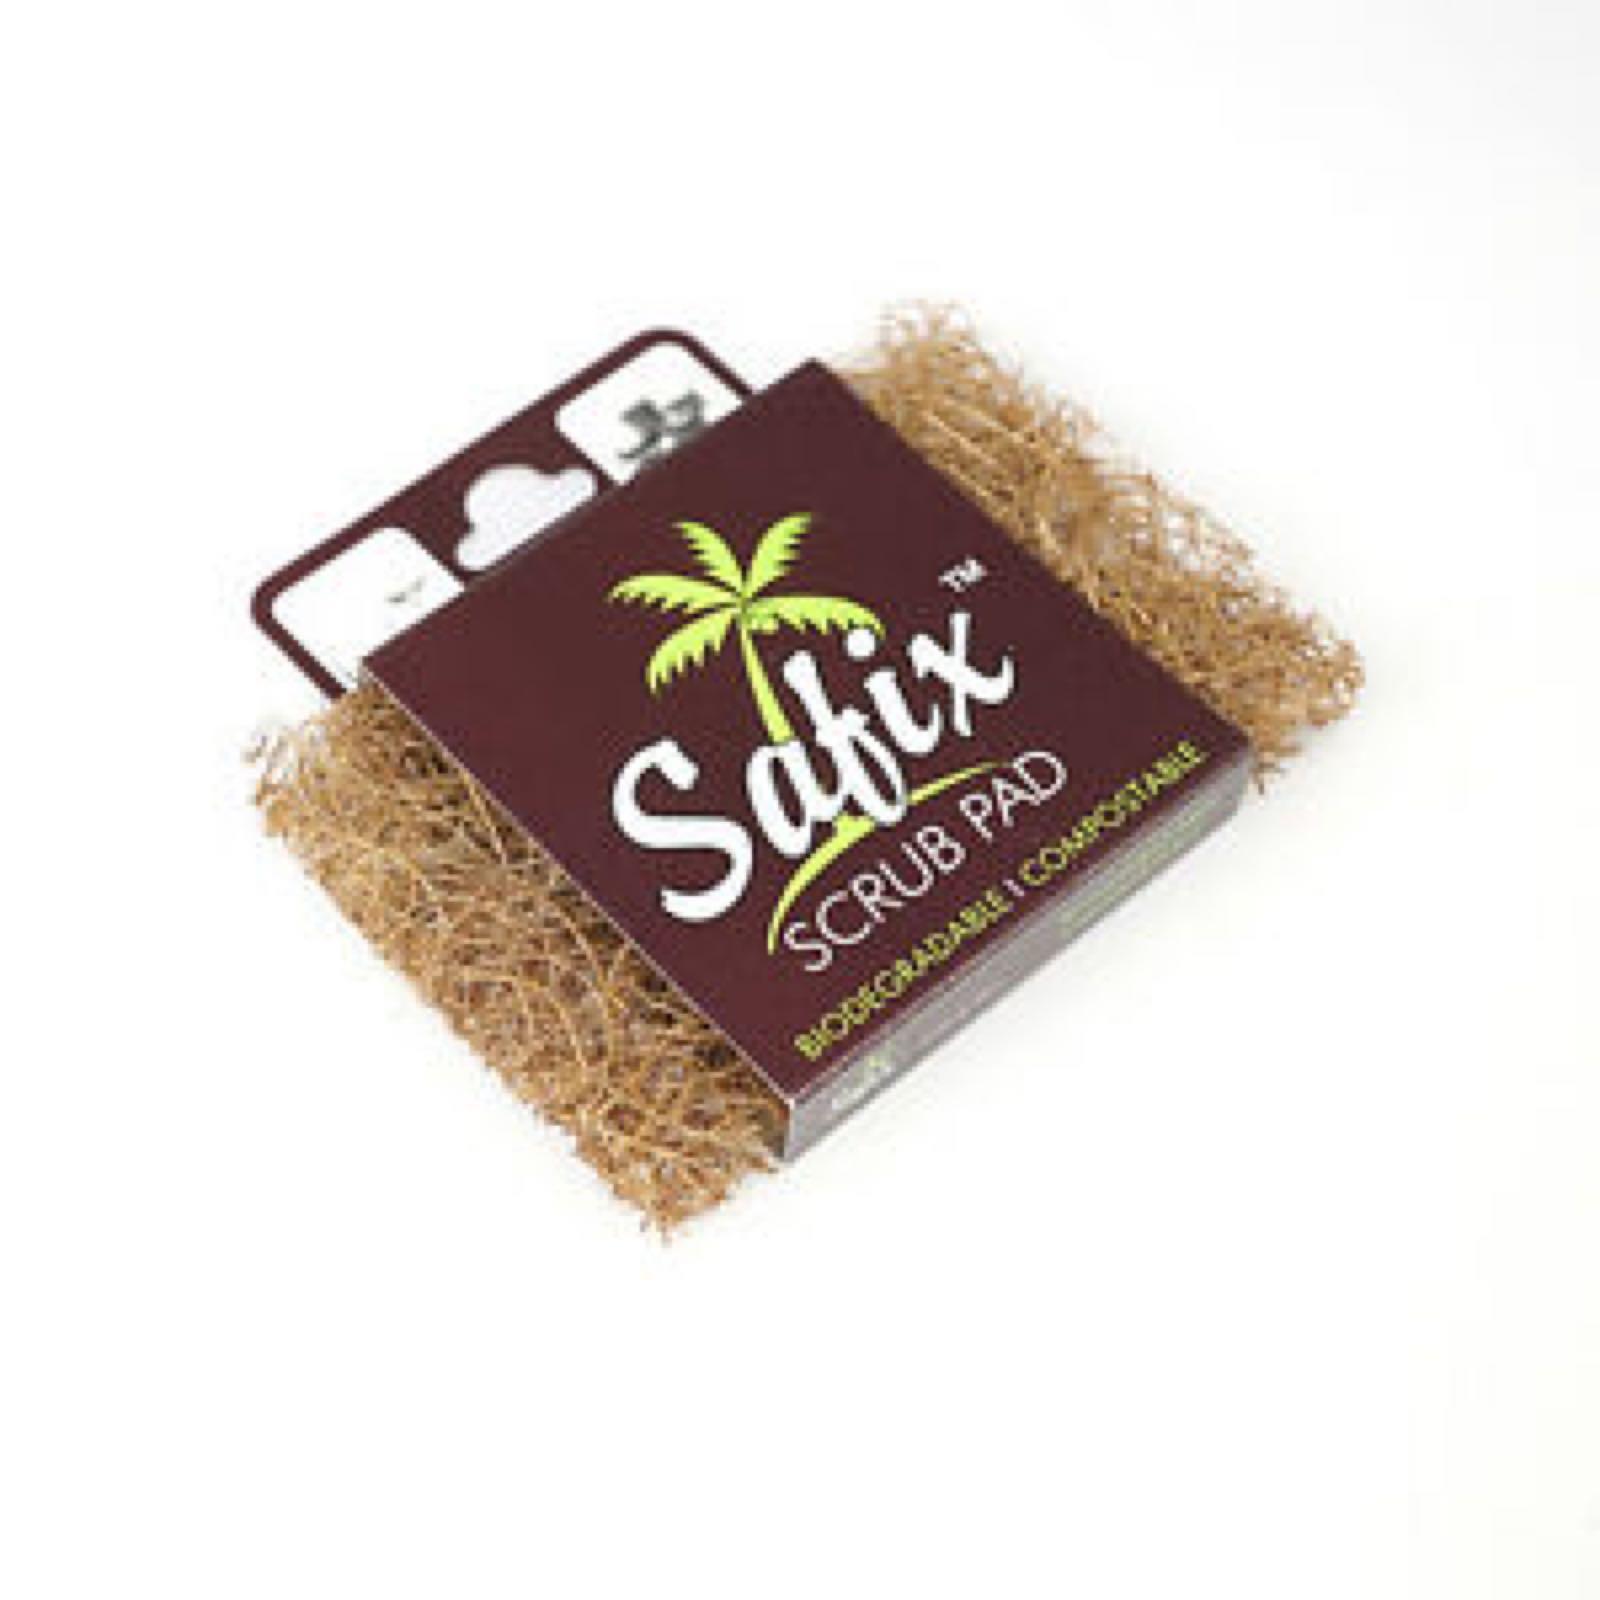 Safix Scourers